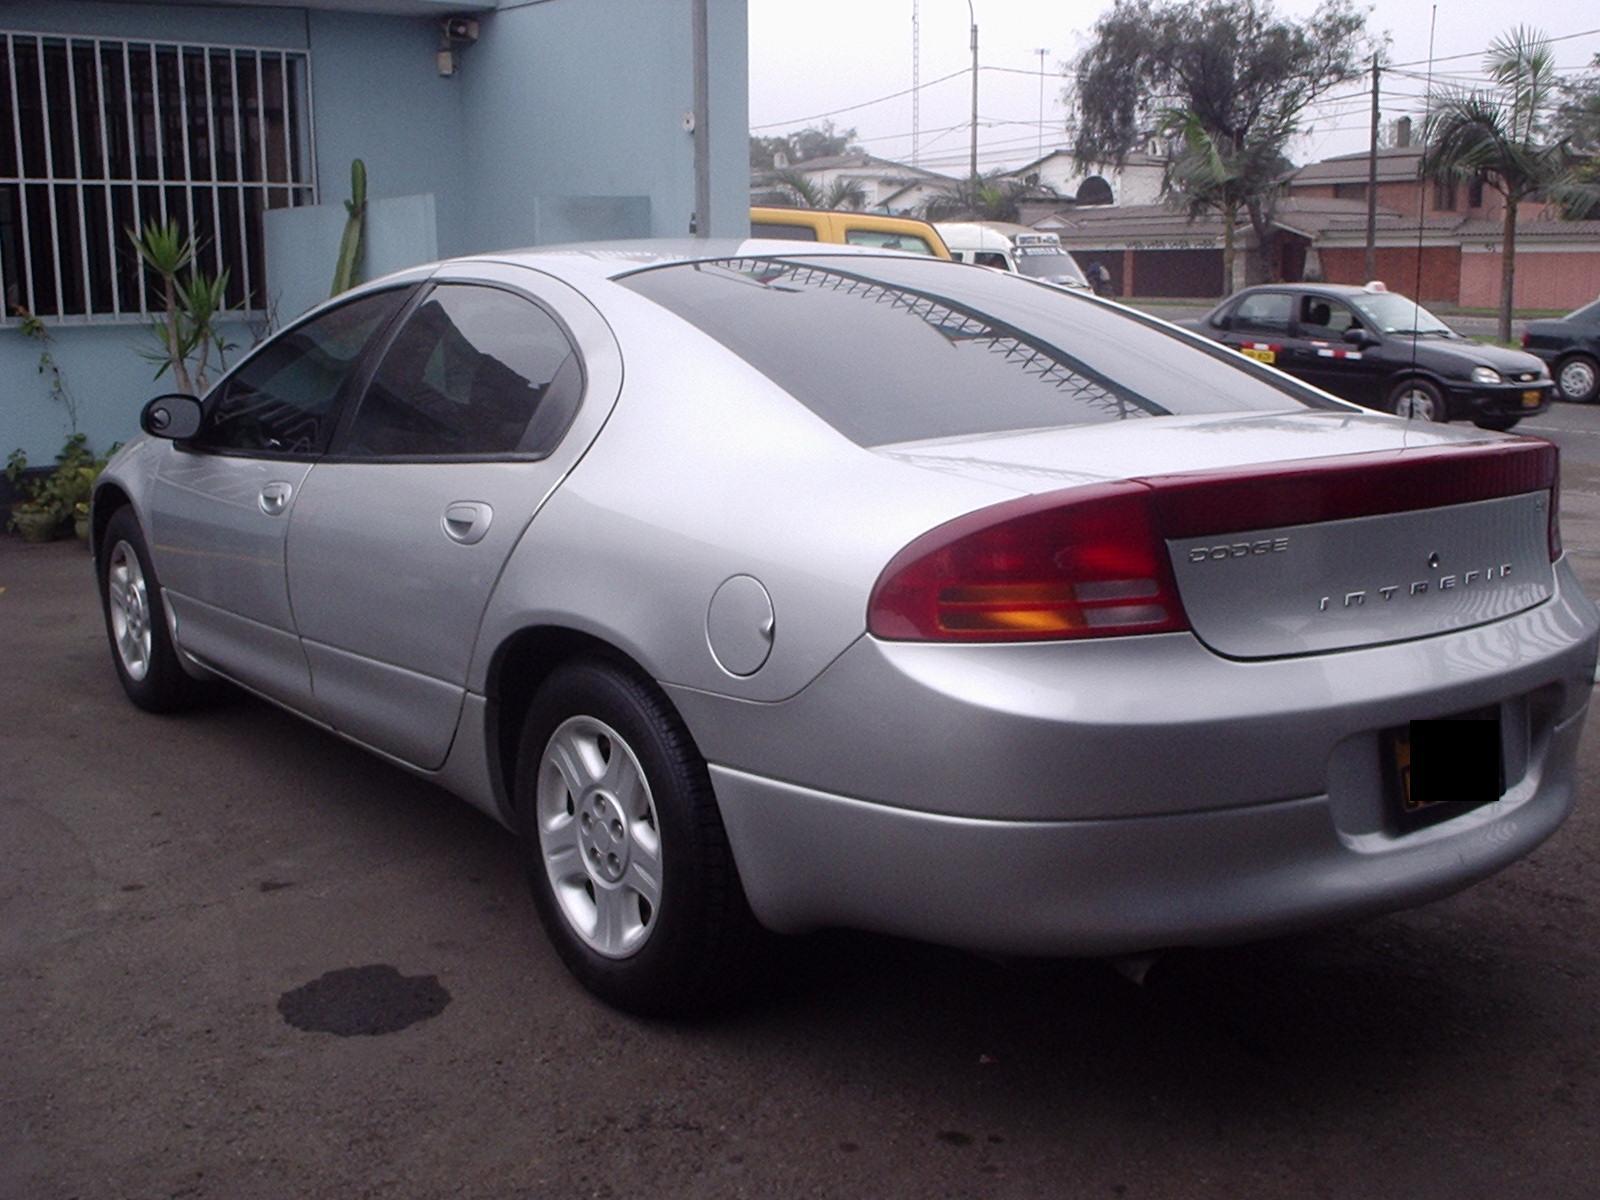 2004 Dodge Intrepid 11 Dodge